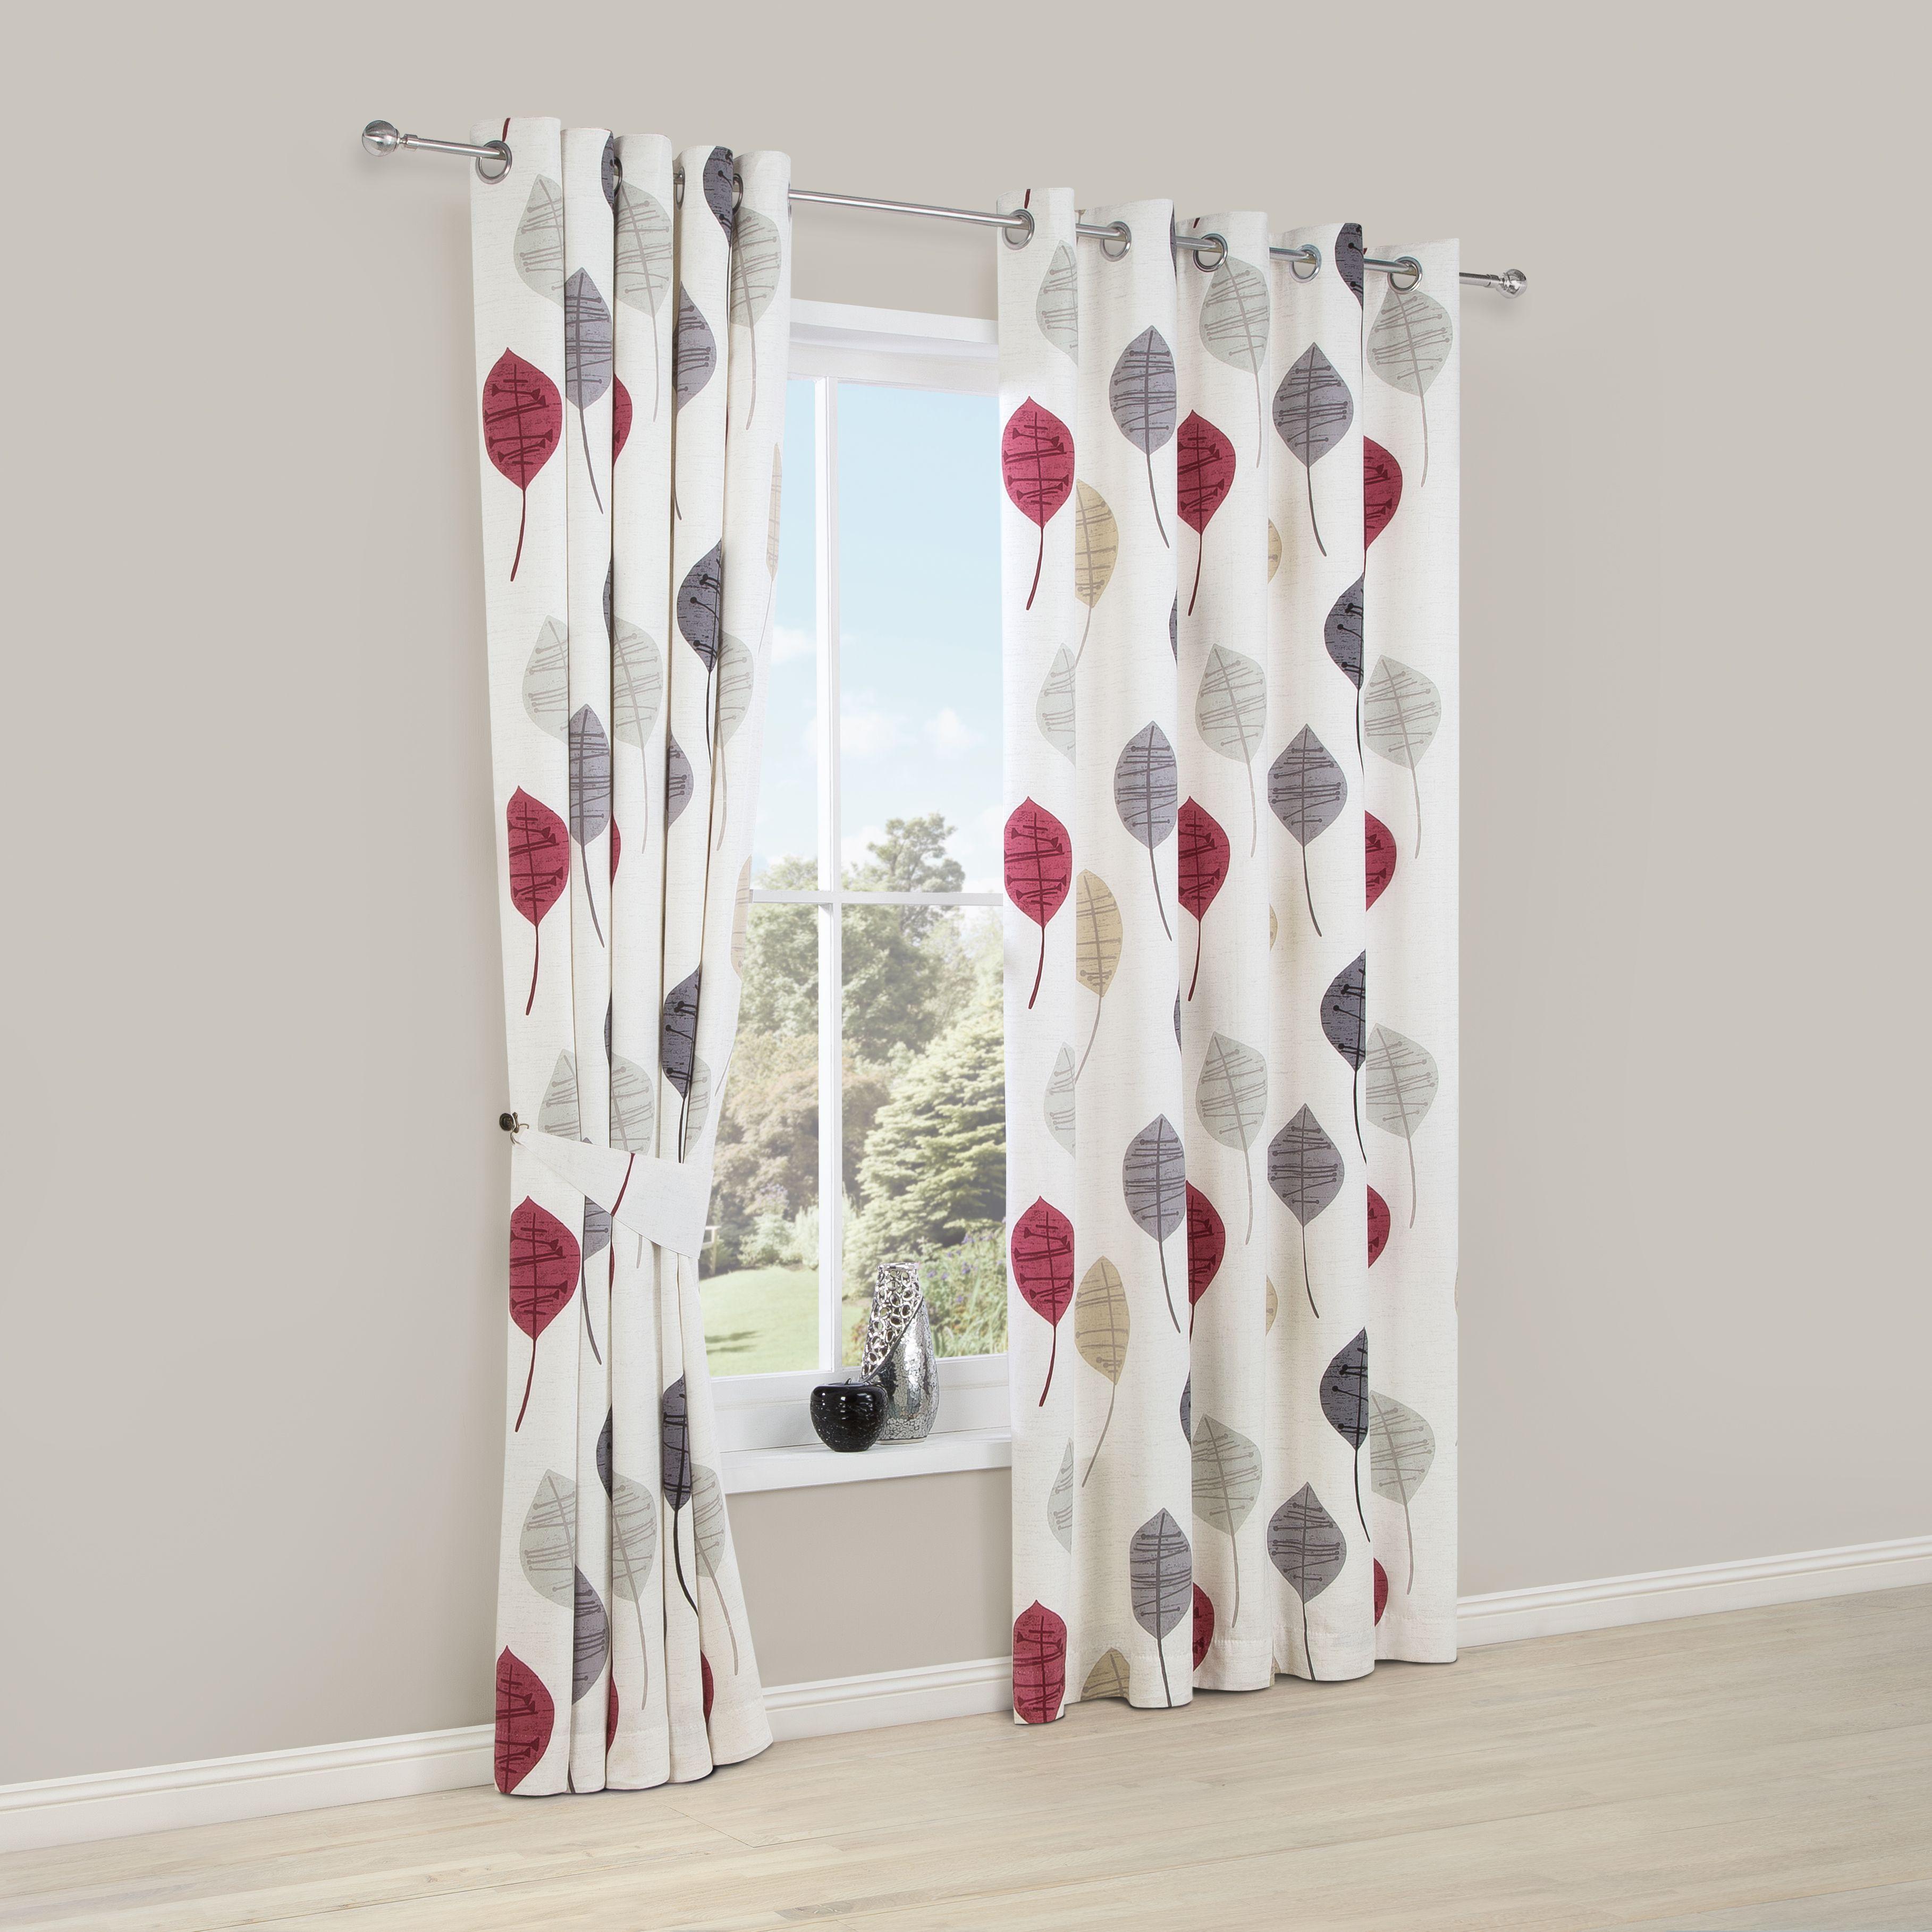 High Quality Dario Beige, Grey, Red U0026 White Floral Printed Eyelet Lined Curtains (W)167  Cm (L)228 Cm | Departments | DIY At Bu0026Q